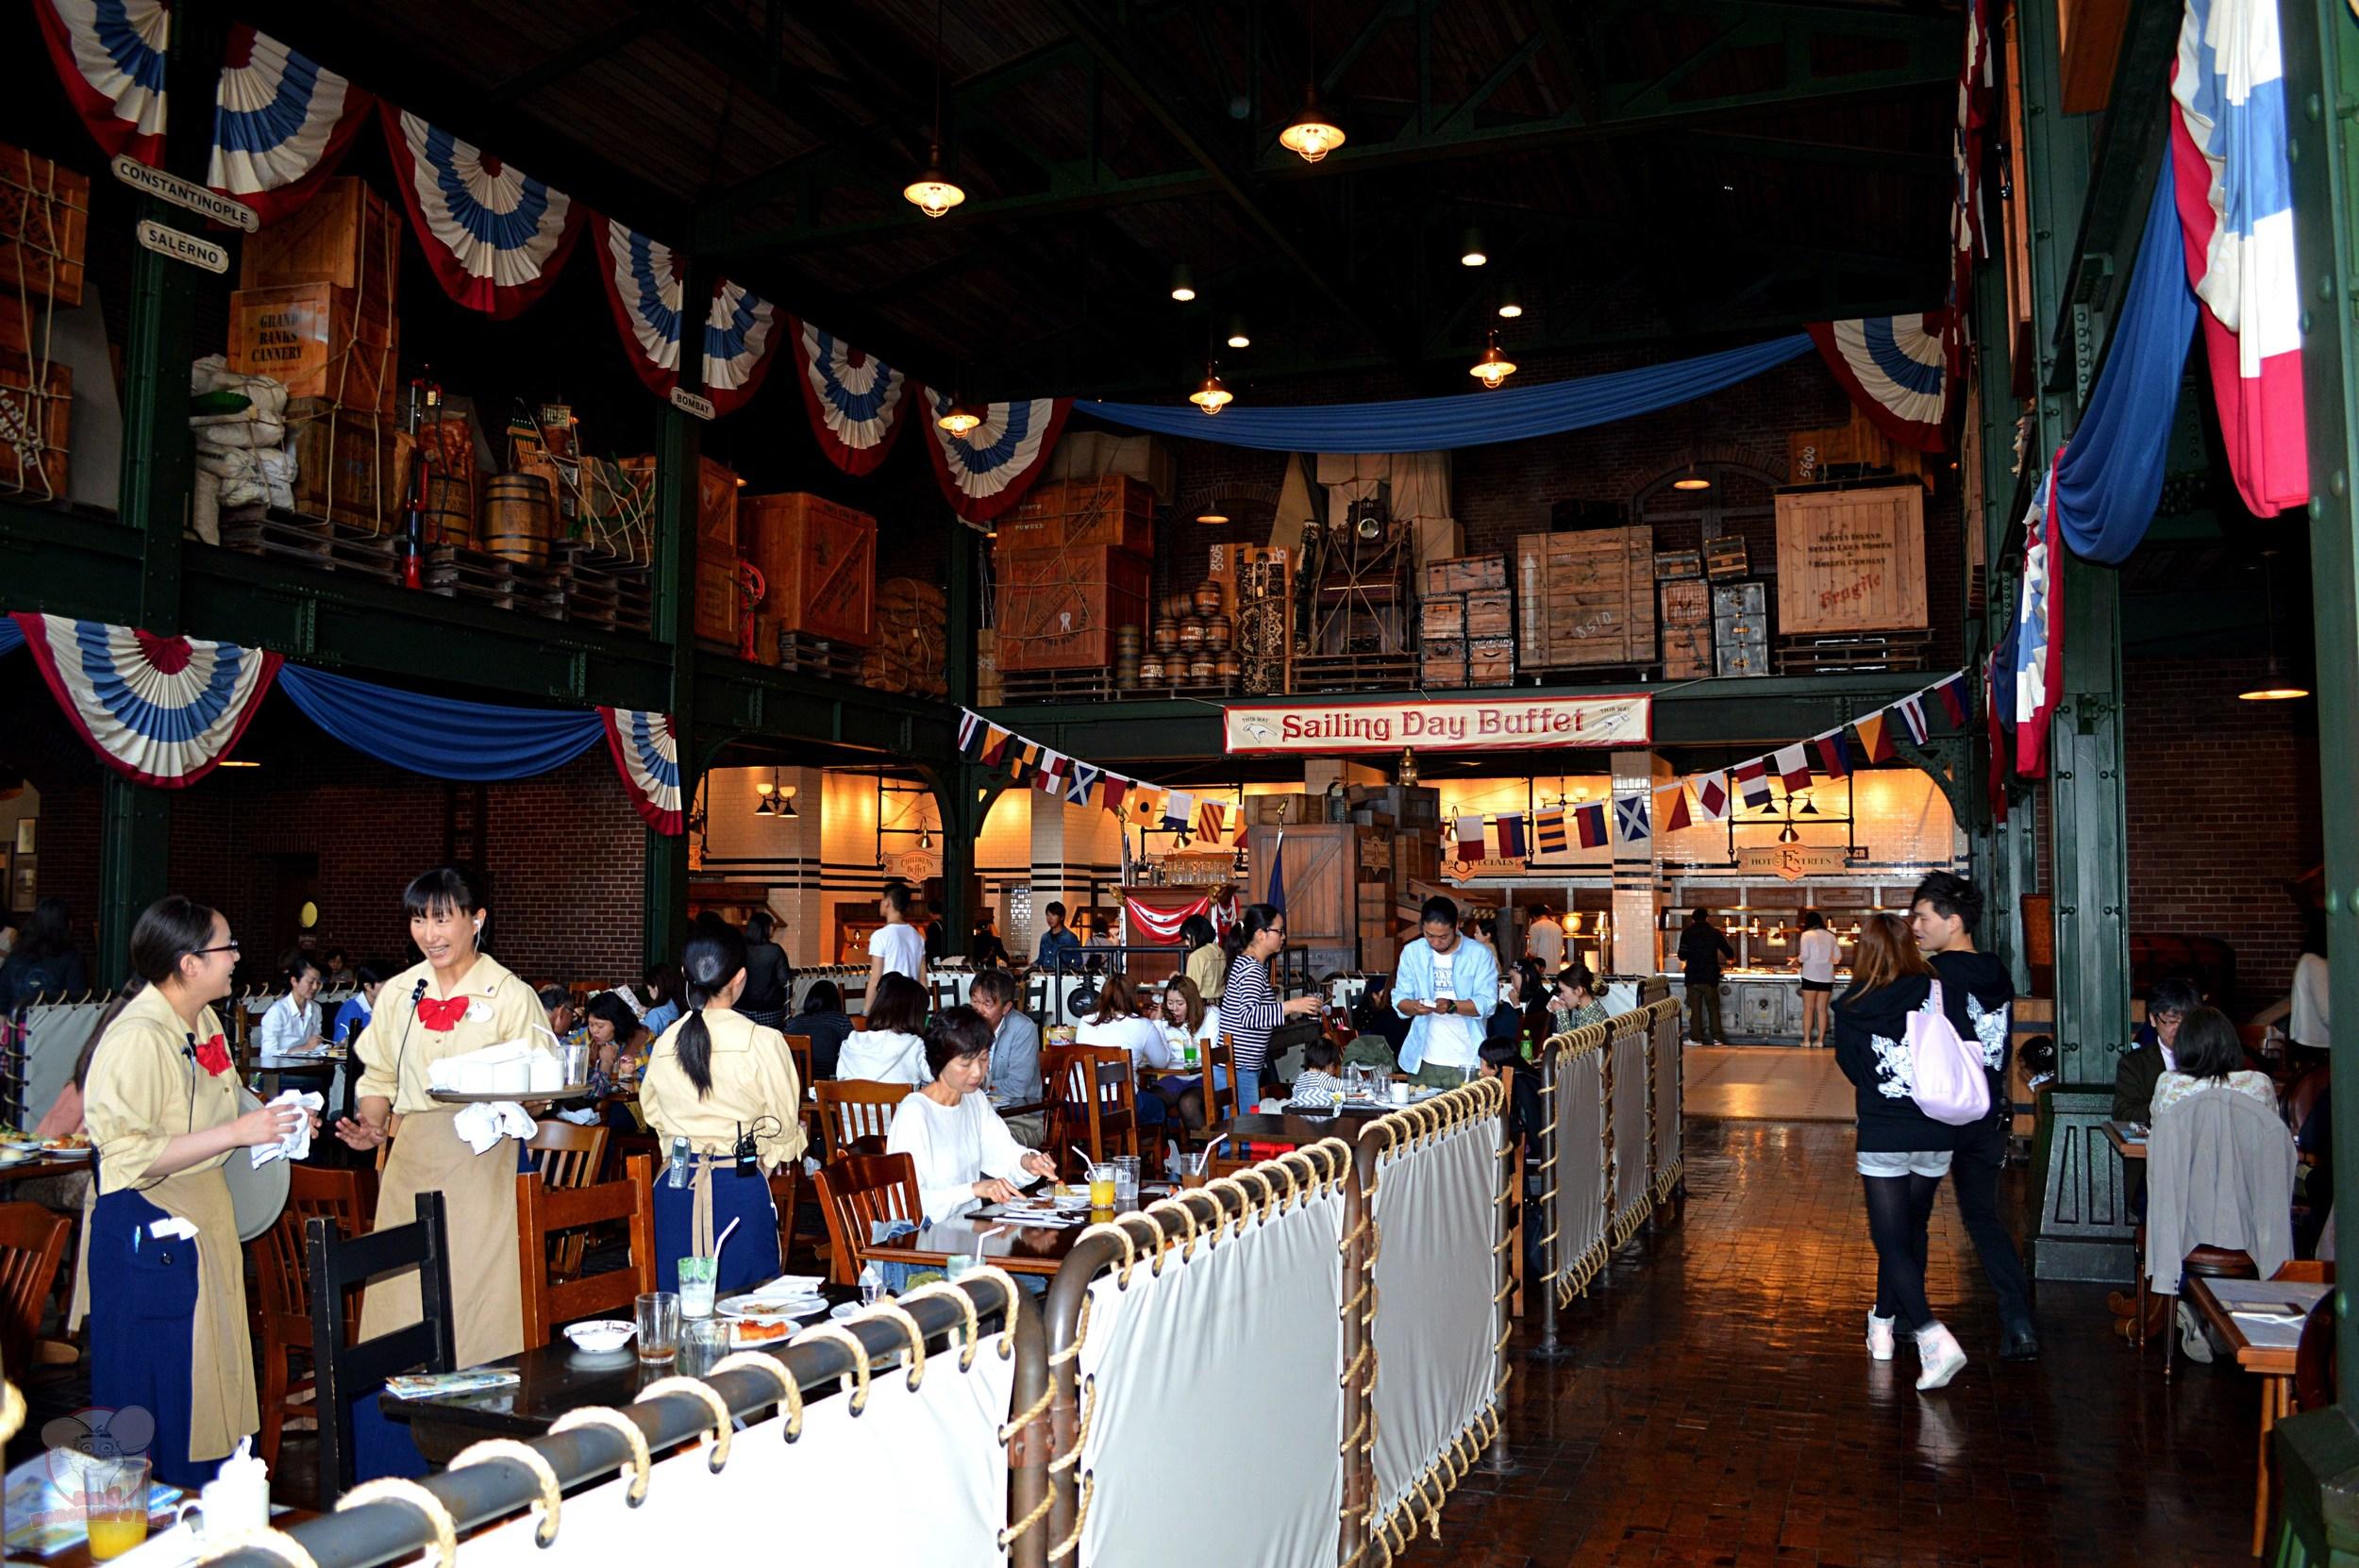 Inside Sailing Day Buffet